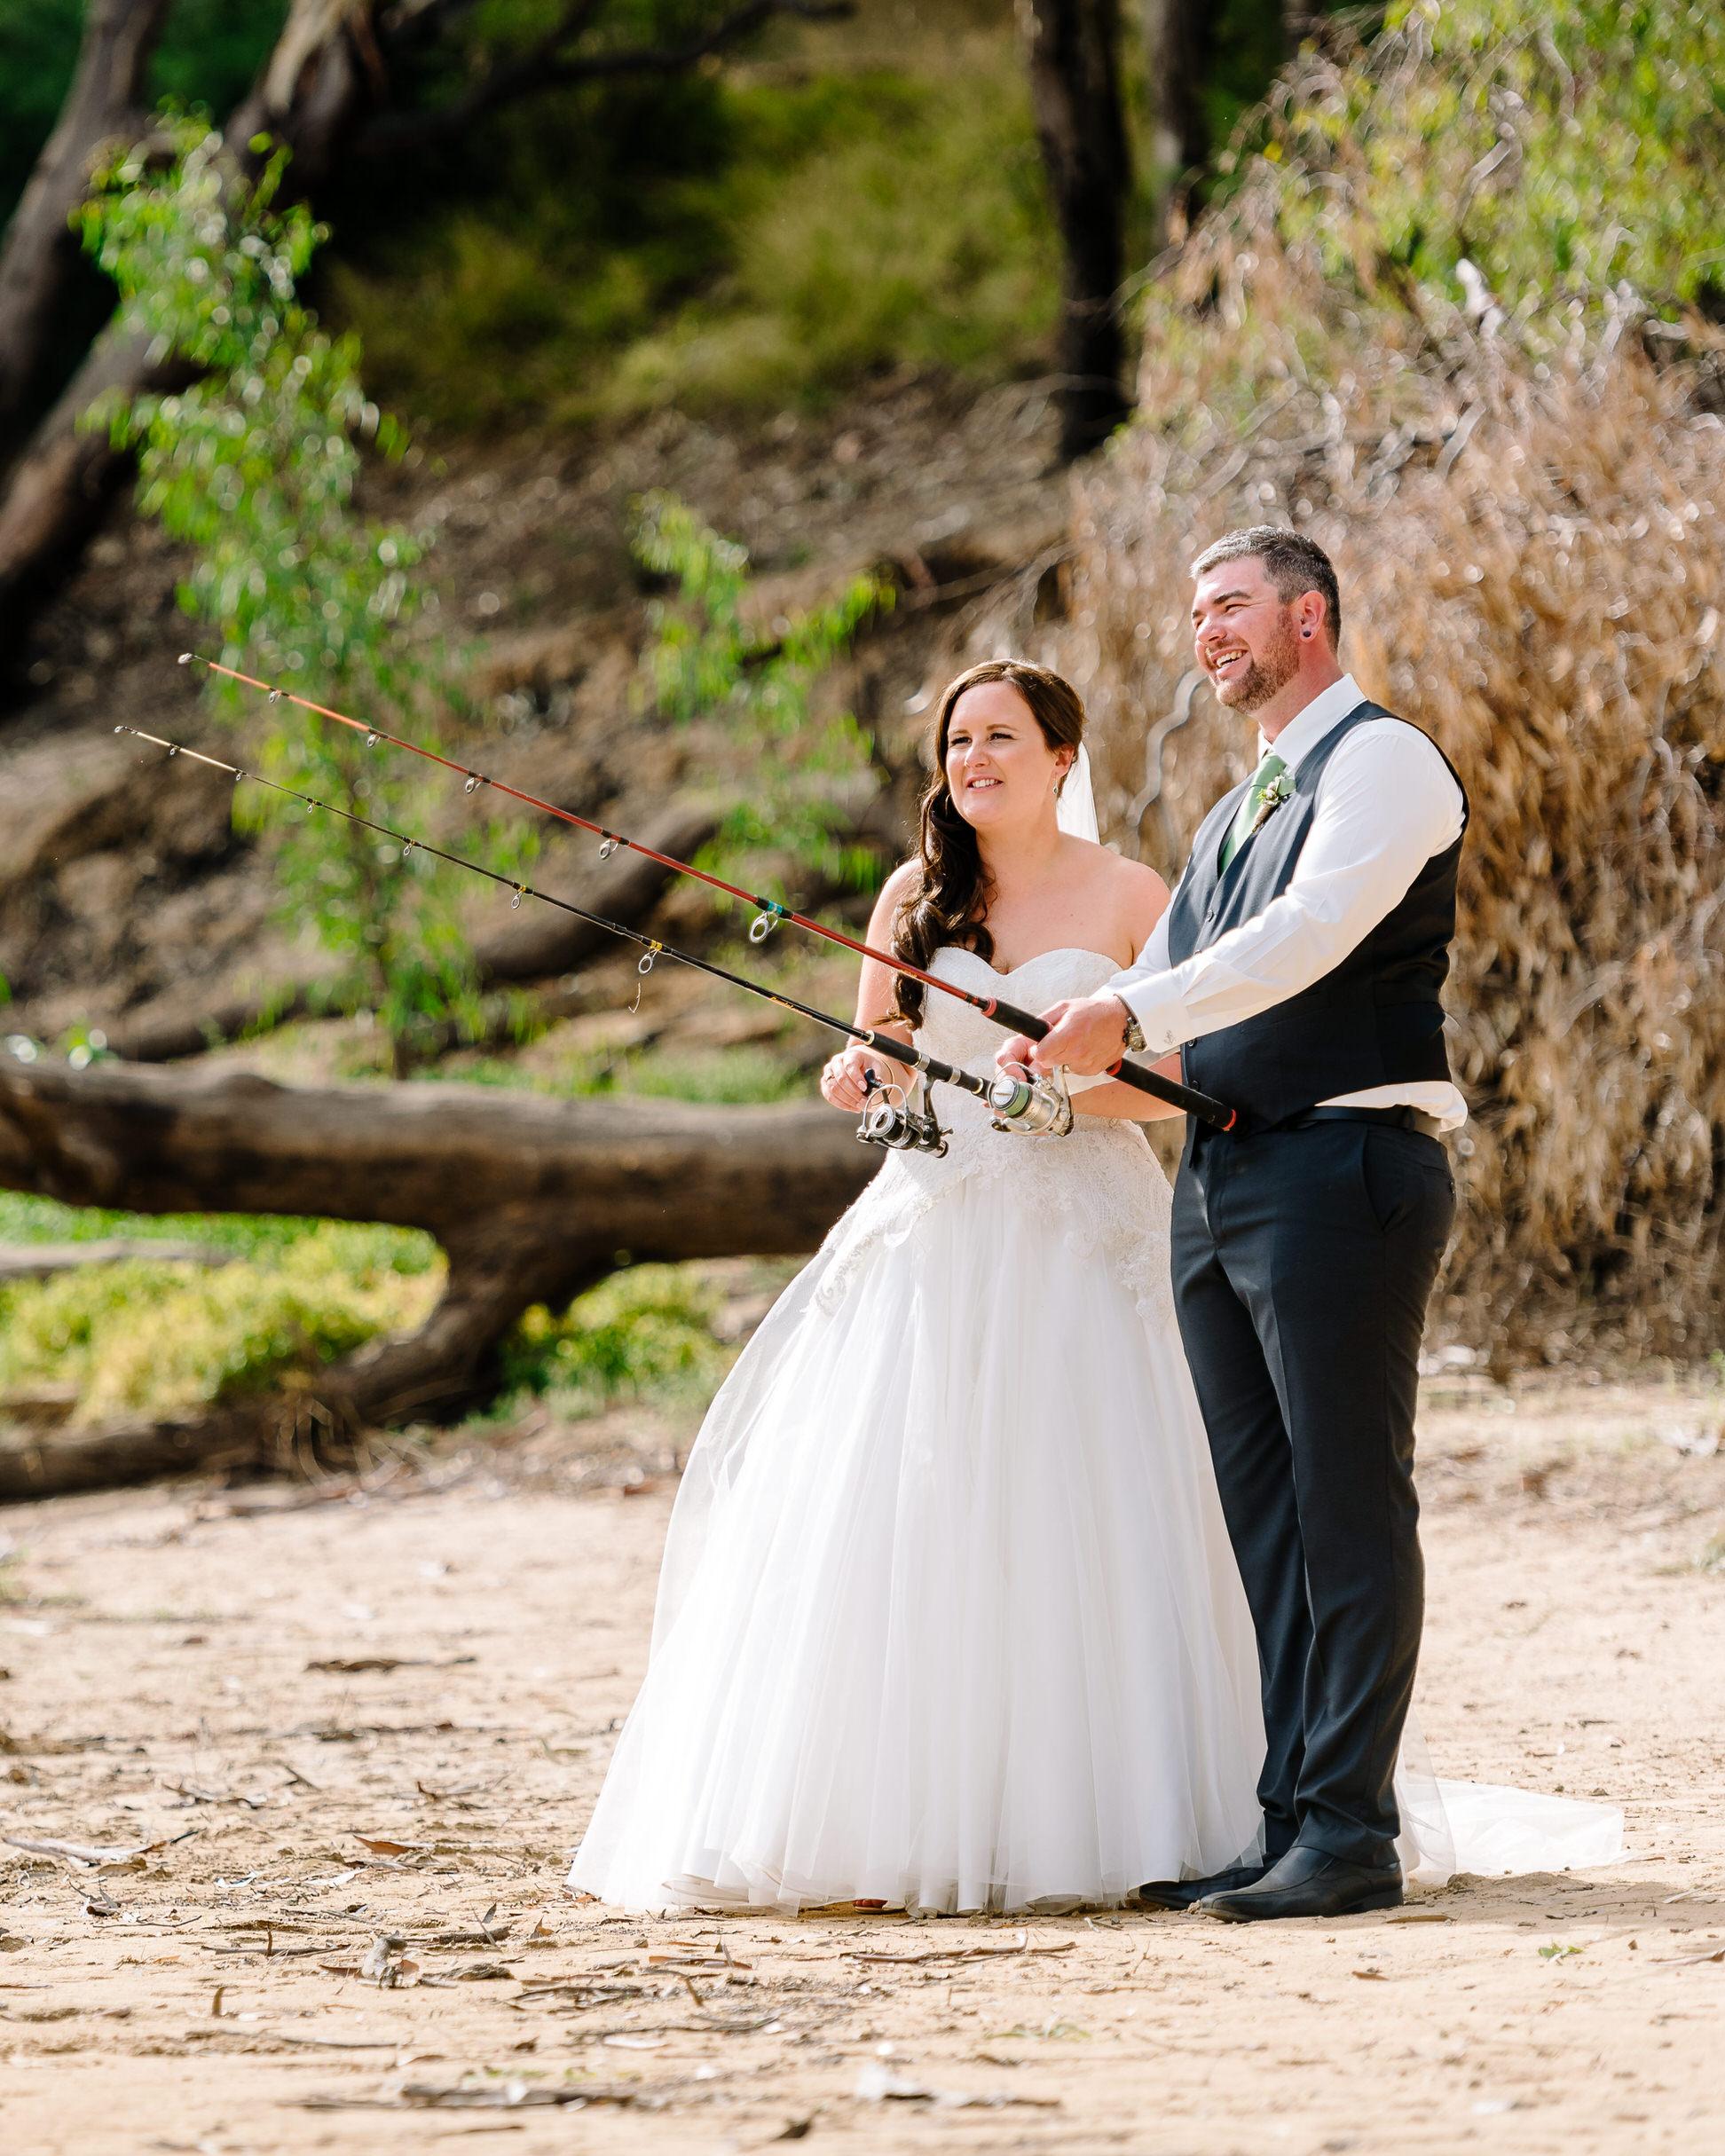 Justin_Jim_Echuca_Wedding_Photography_Tindarra-224.JPG